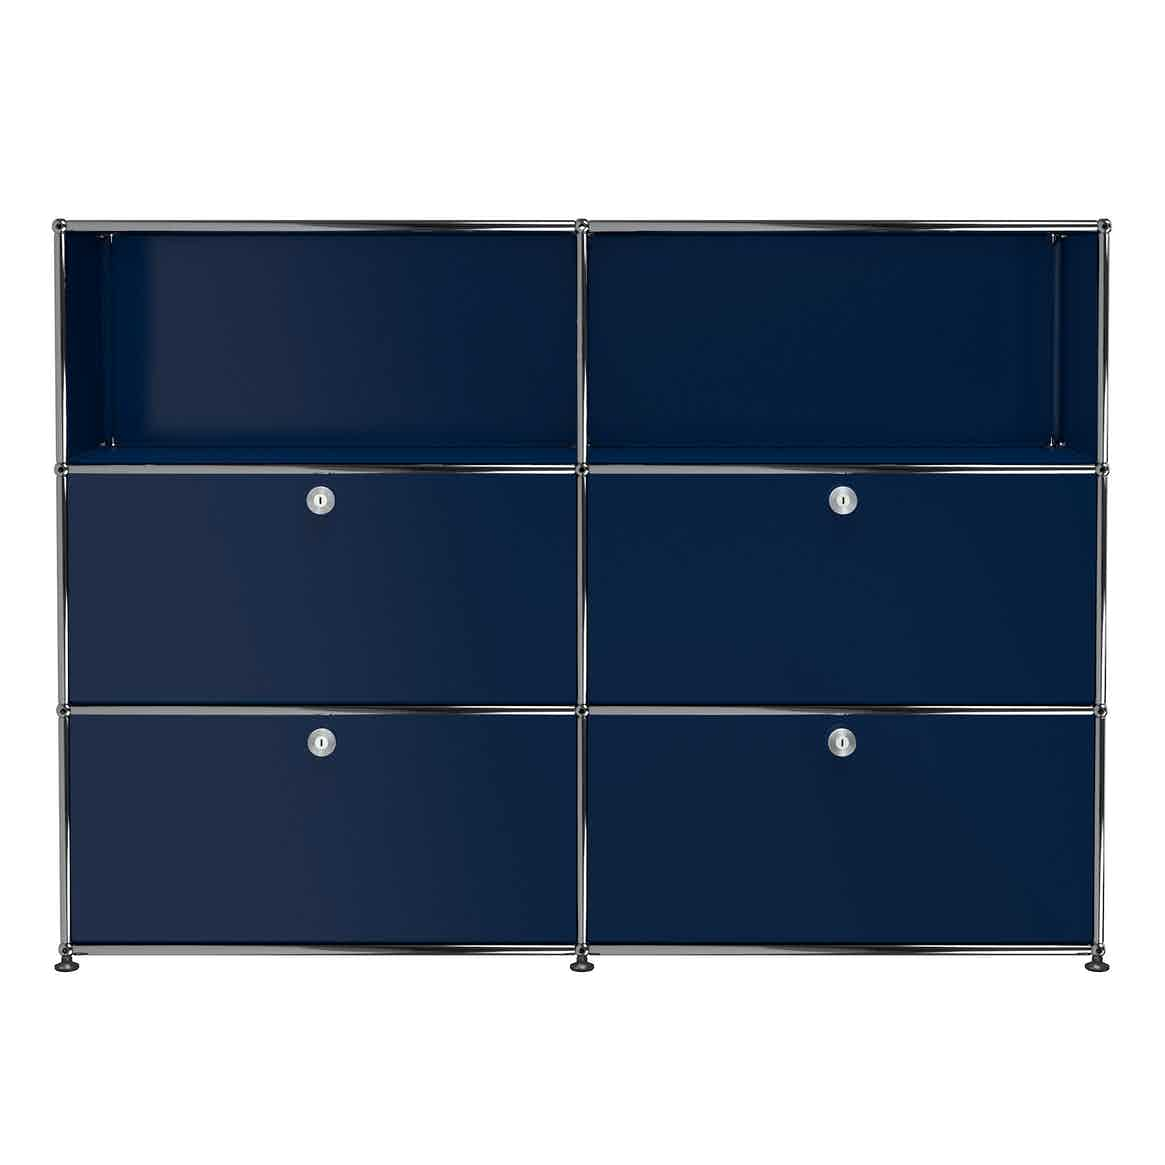 Usm-quick-shop-Haller-Storage-G2A-steel-blue-haute-living